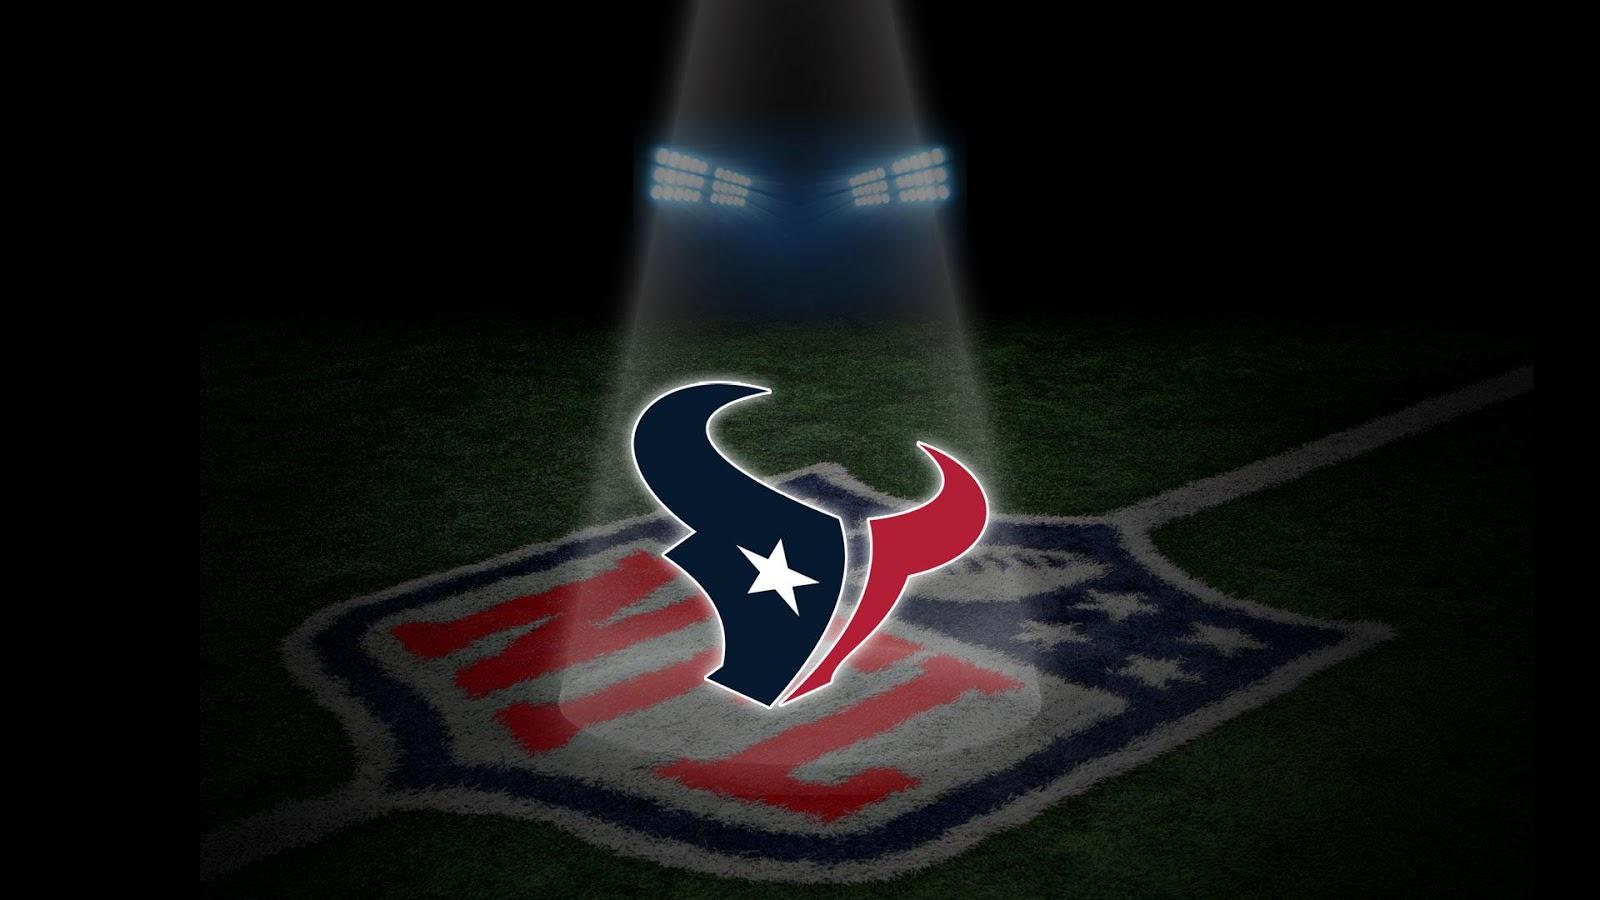 Houston Texans Live Wallpaper 10 screenshot 0 1600x900